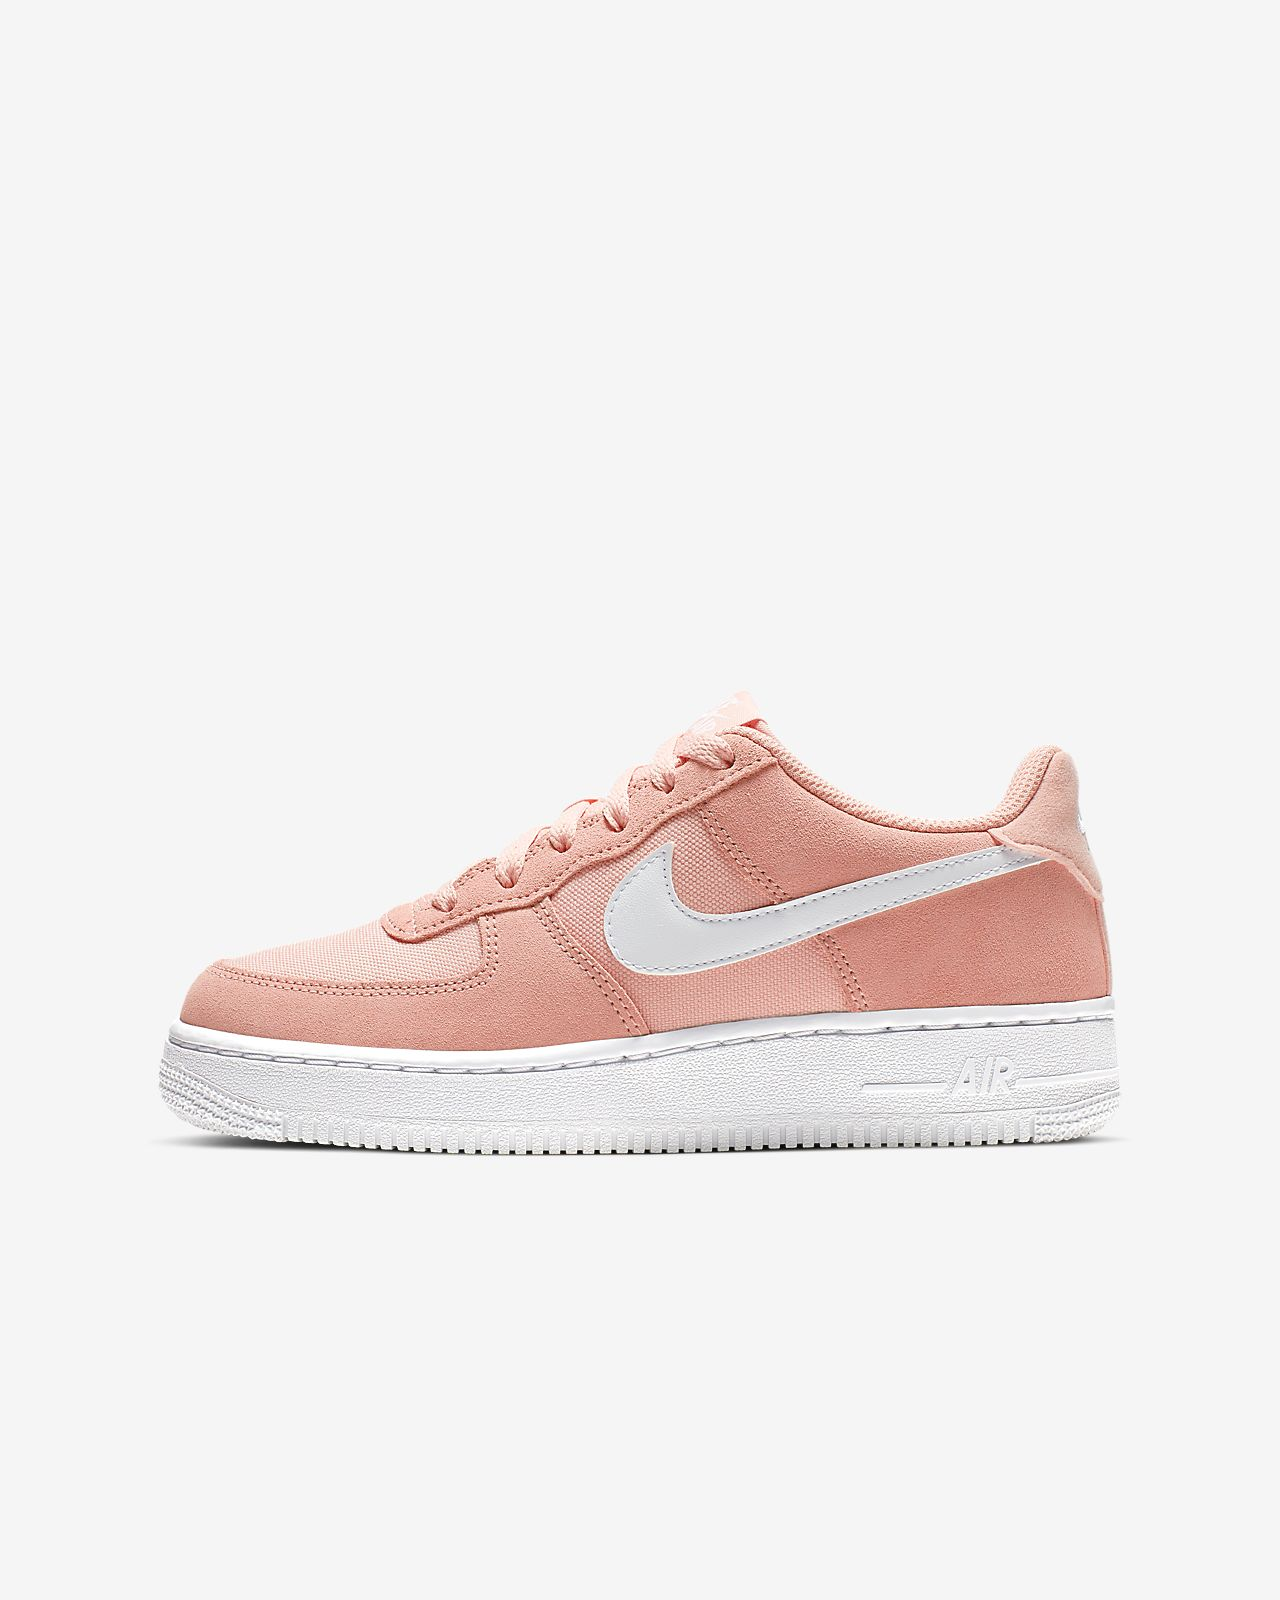 Nike Air Force 1 PE Big Kids' Shoe